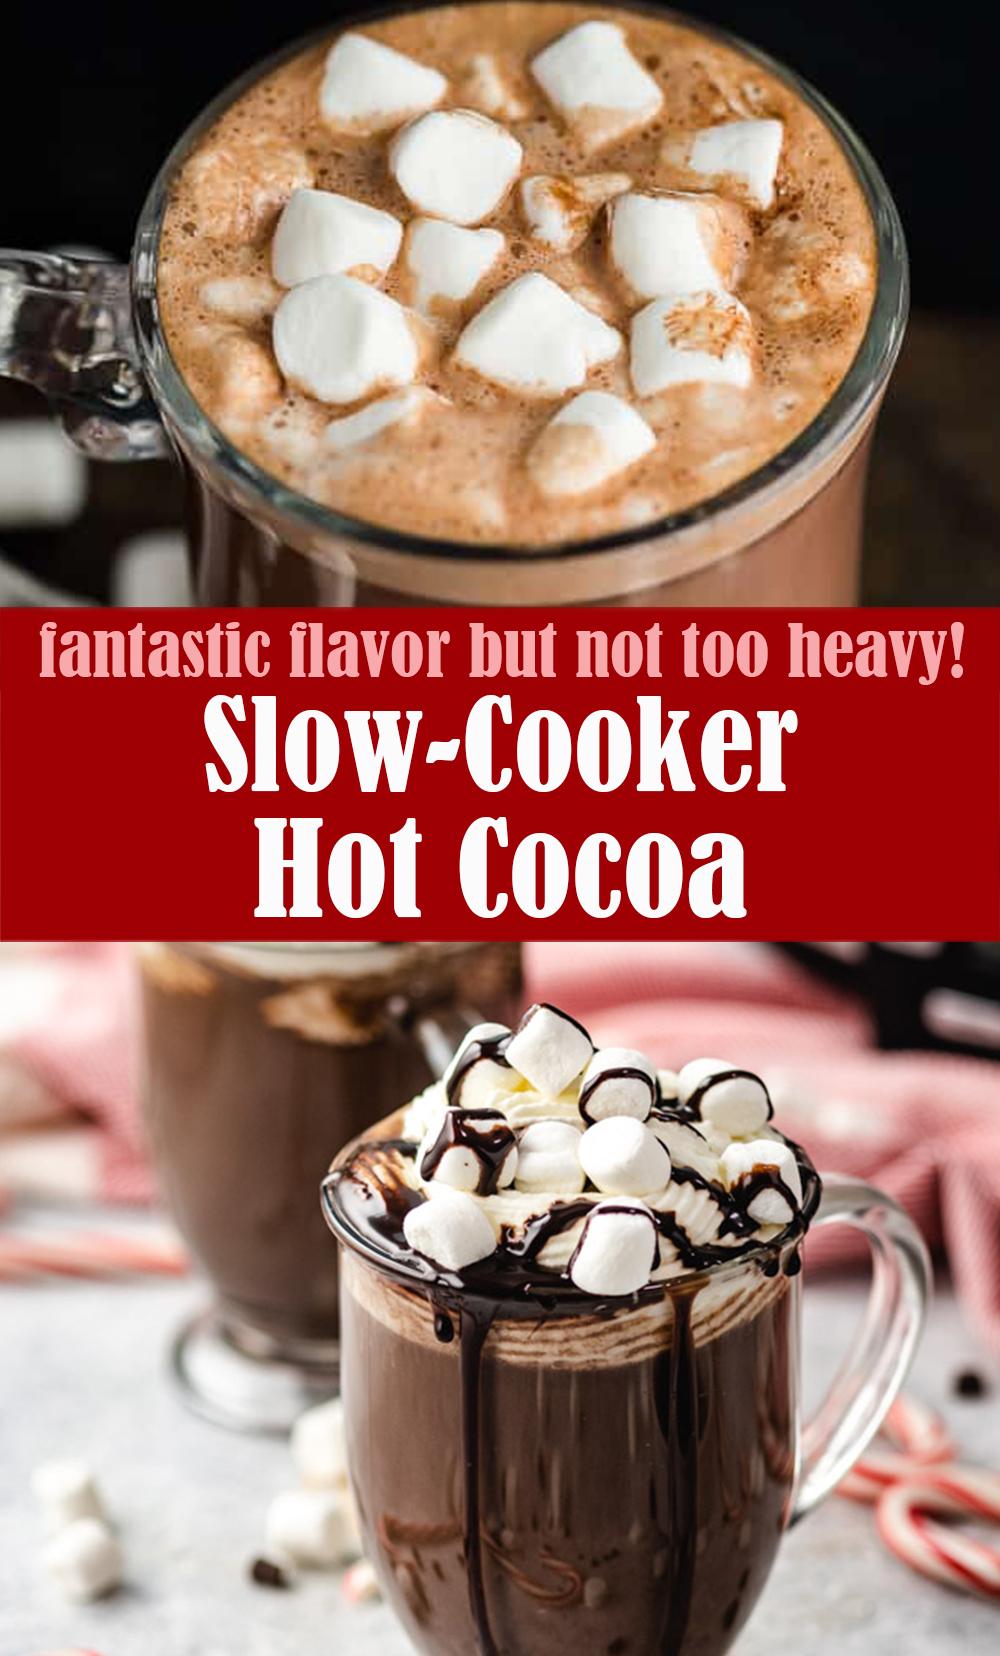 Slow-Cooker Hot Cocoa Recipe